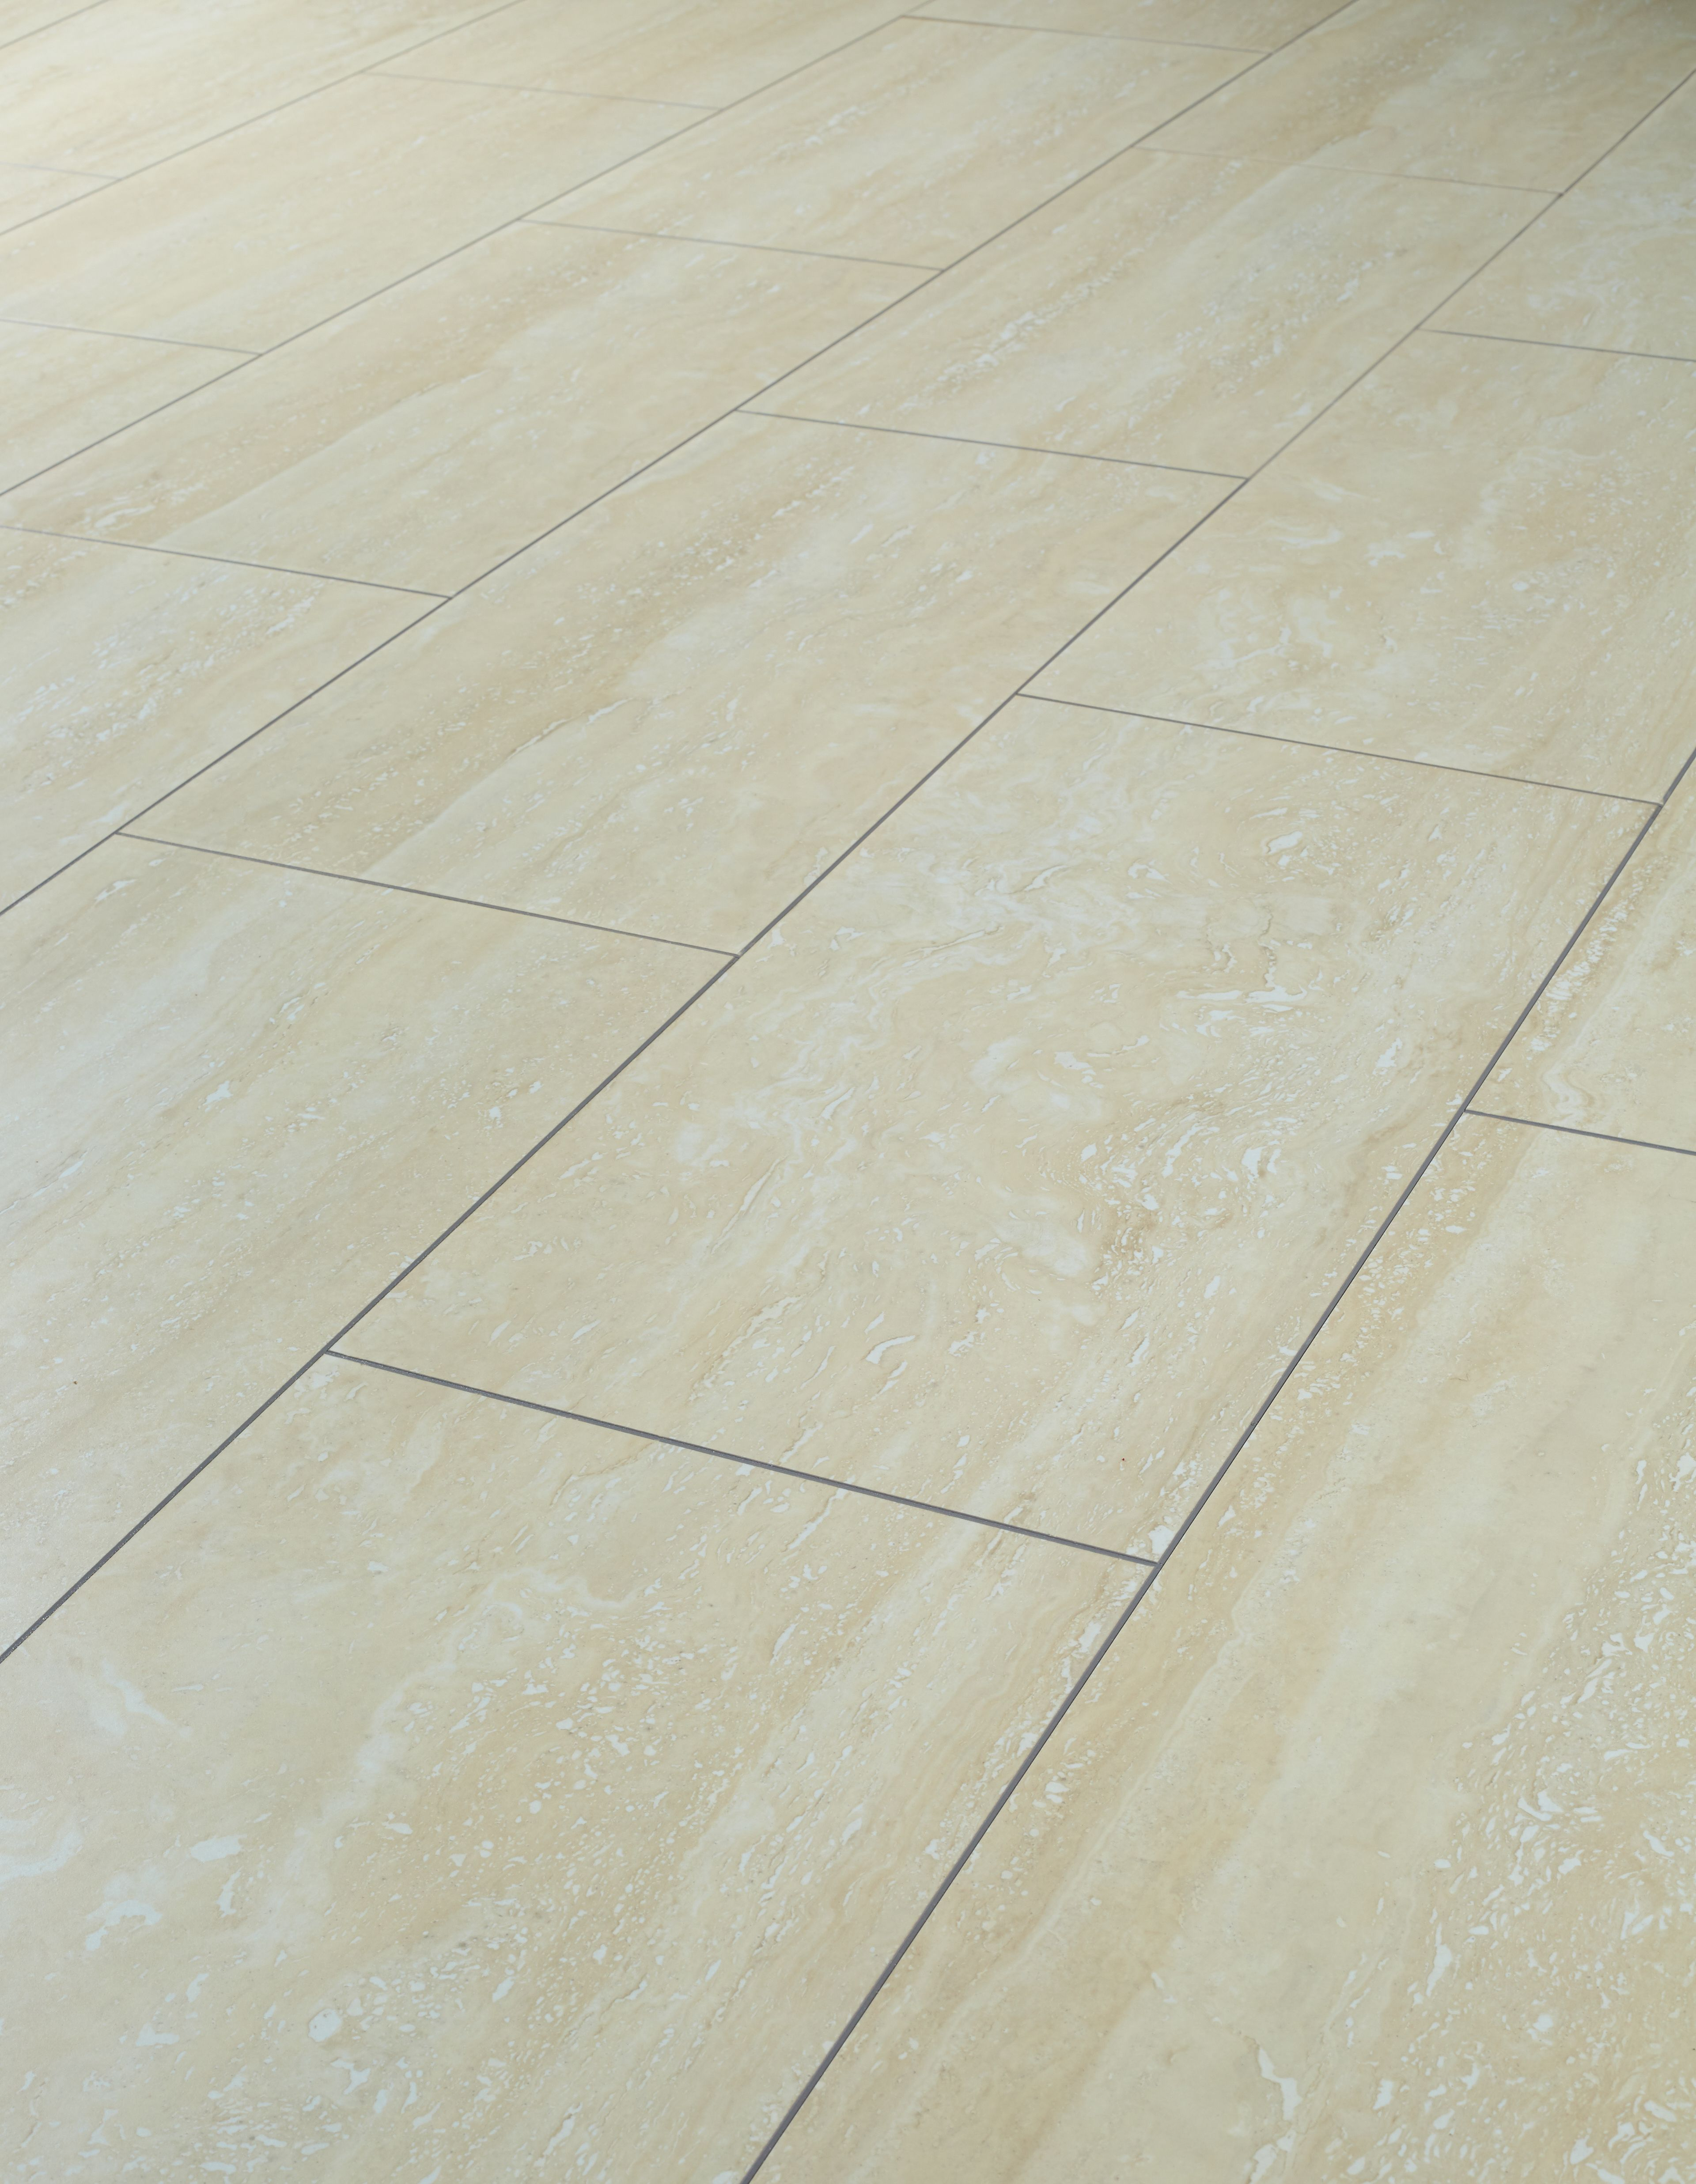 Wickes Travertine Tile Effect Laminate Flooring 2.5m2